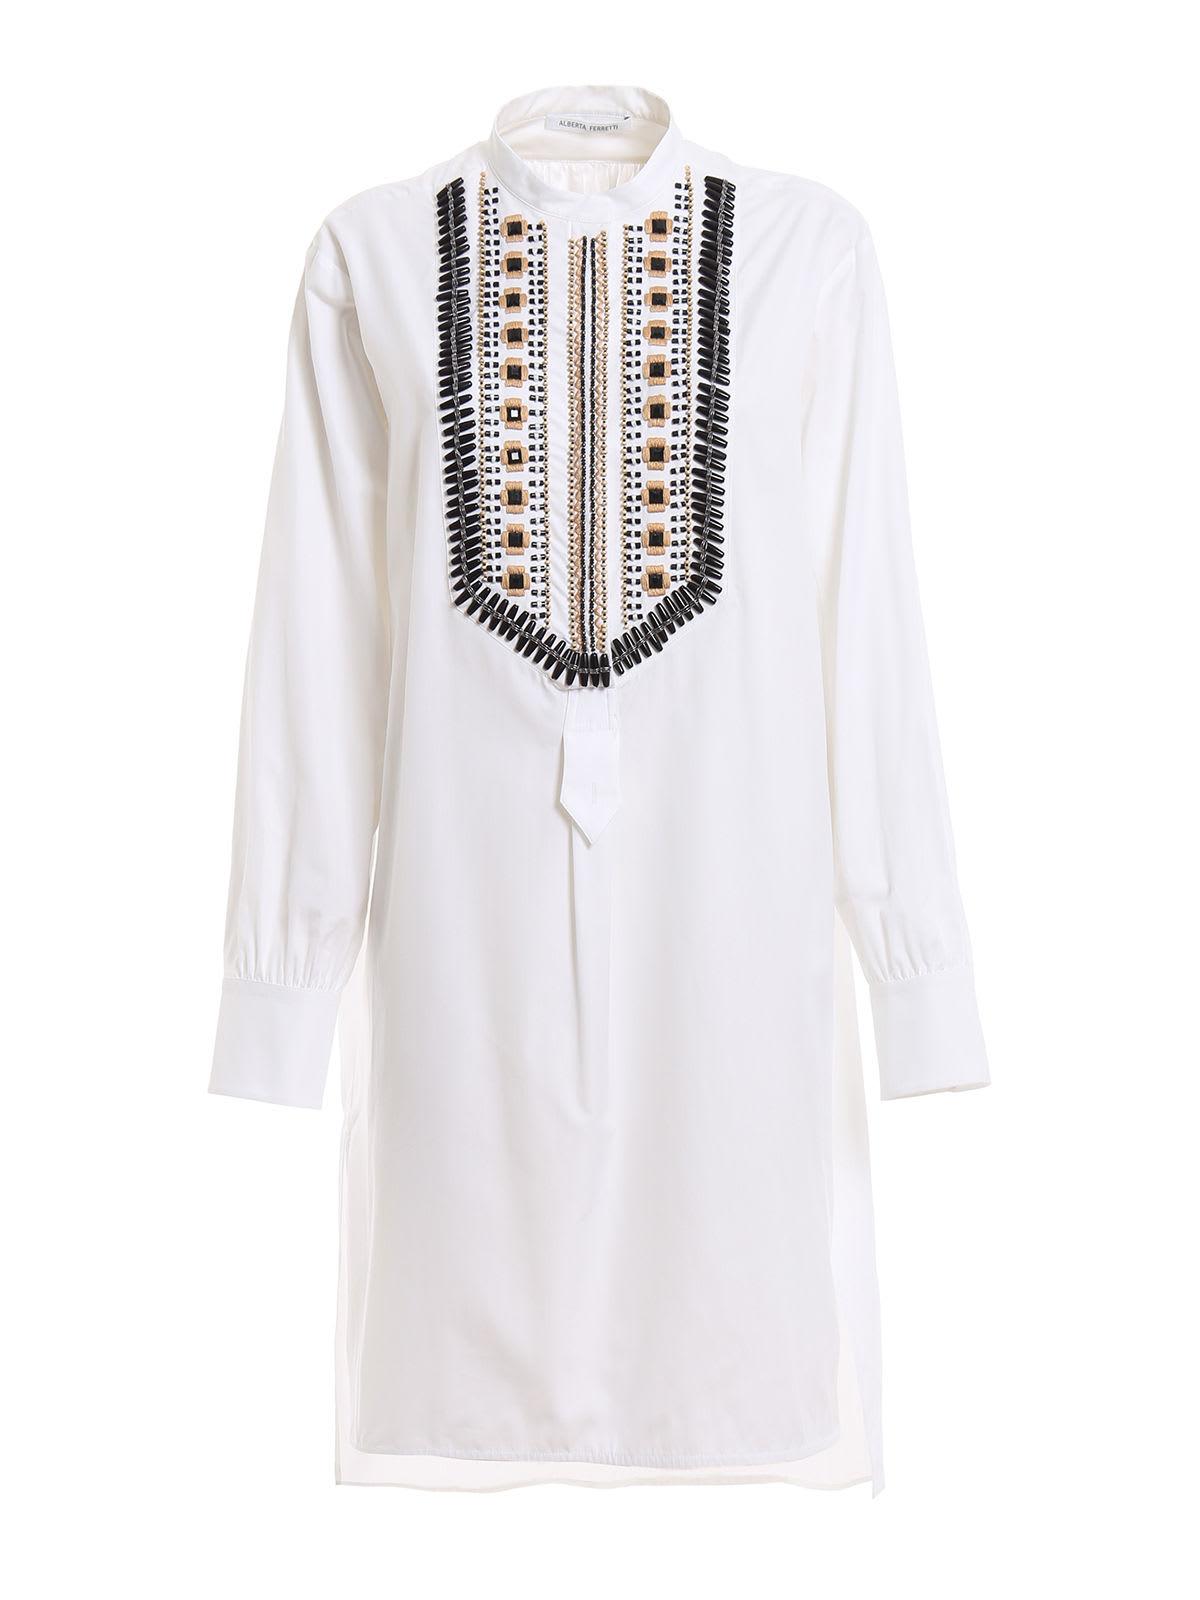 Alberta Ferretti Beaded Shirt Dress